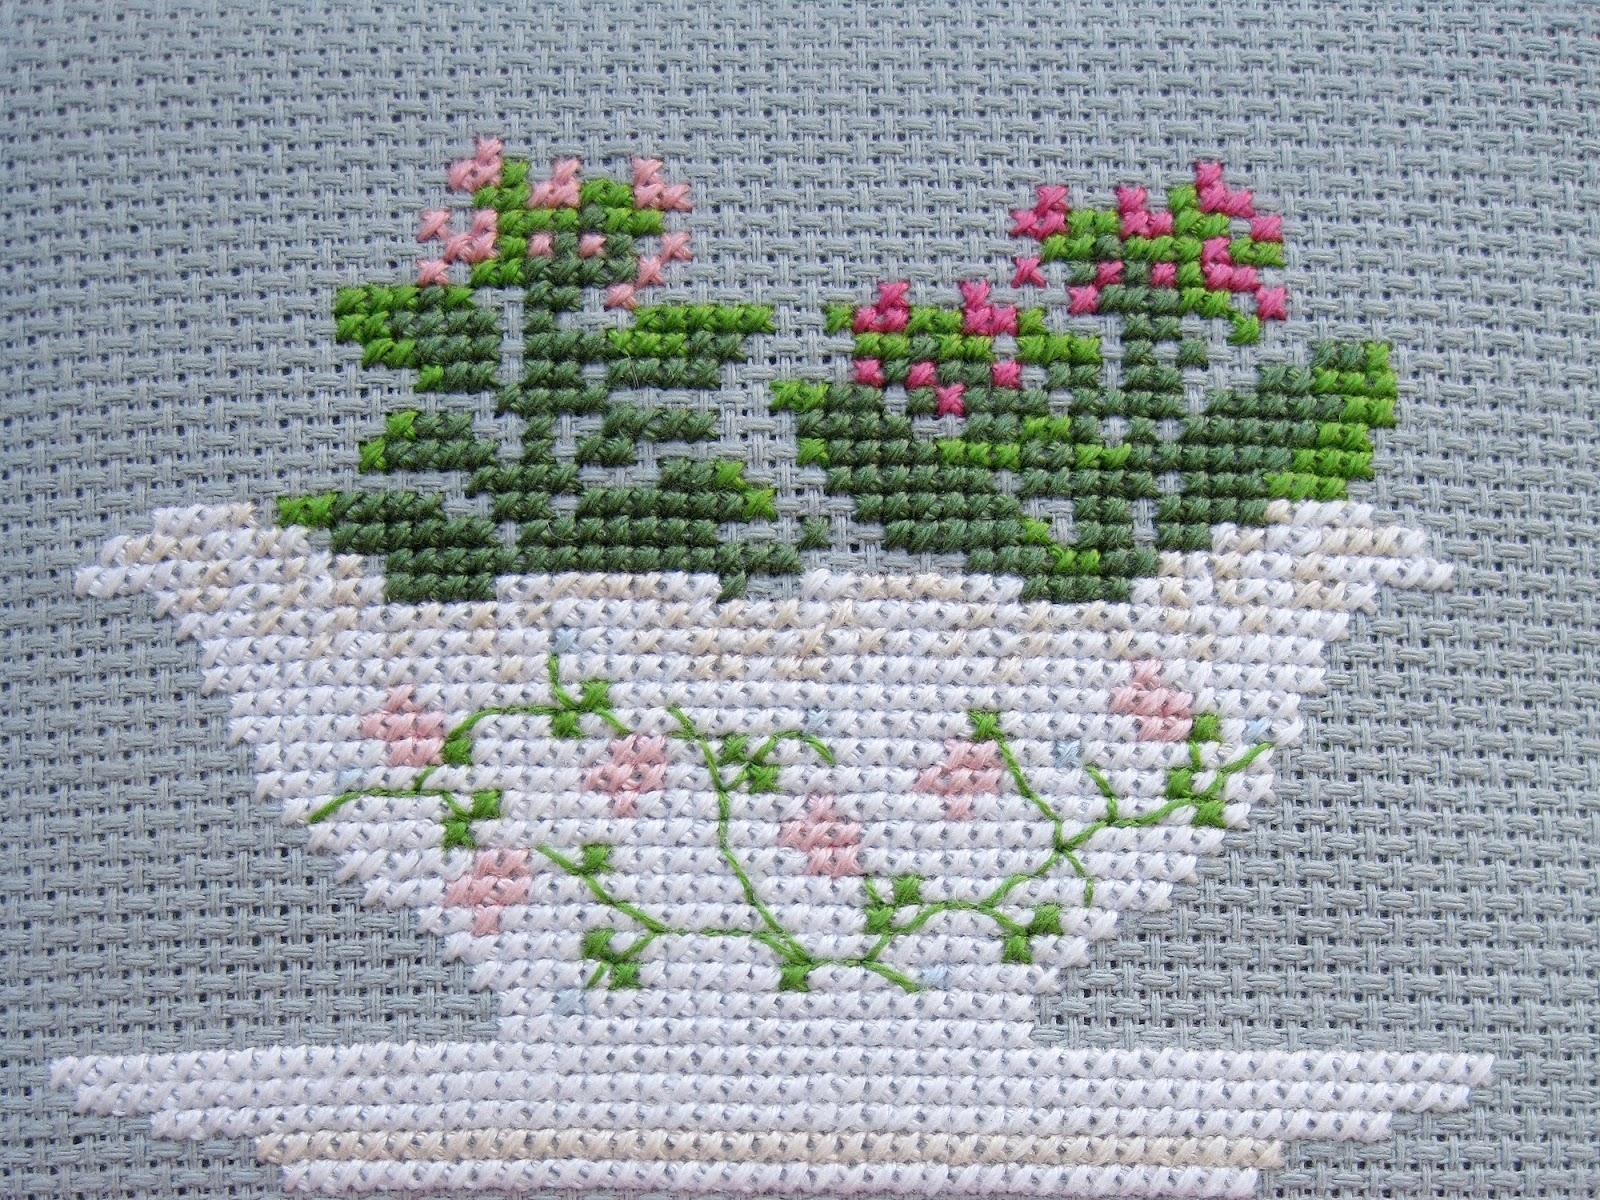 cross stitch вышивка крестиком каланхоэ Kalanchoe Kissy-Cross